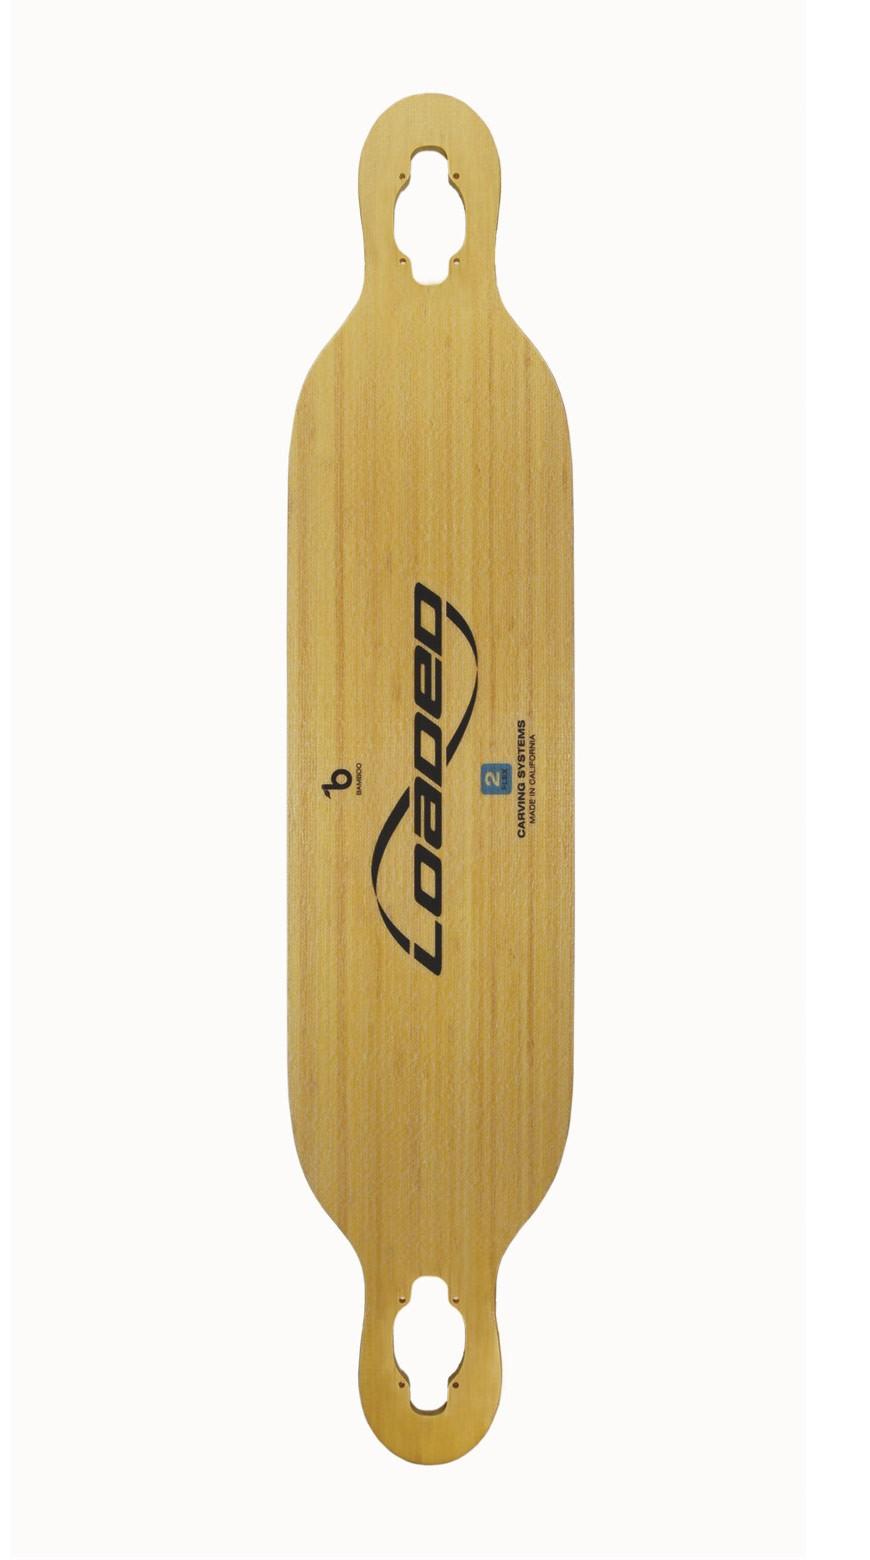 Picture of Choose Longboard Design.